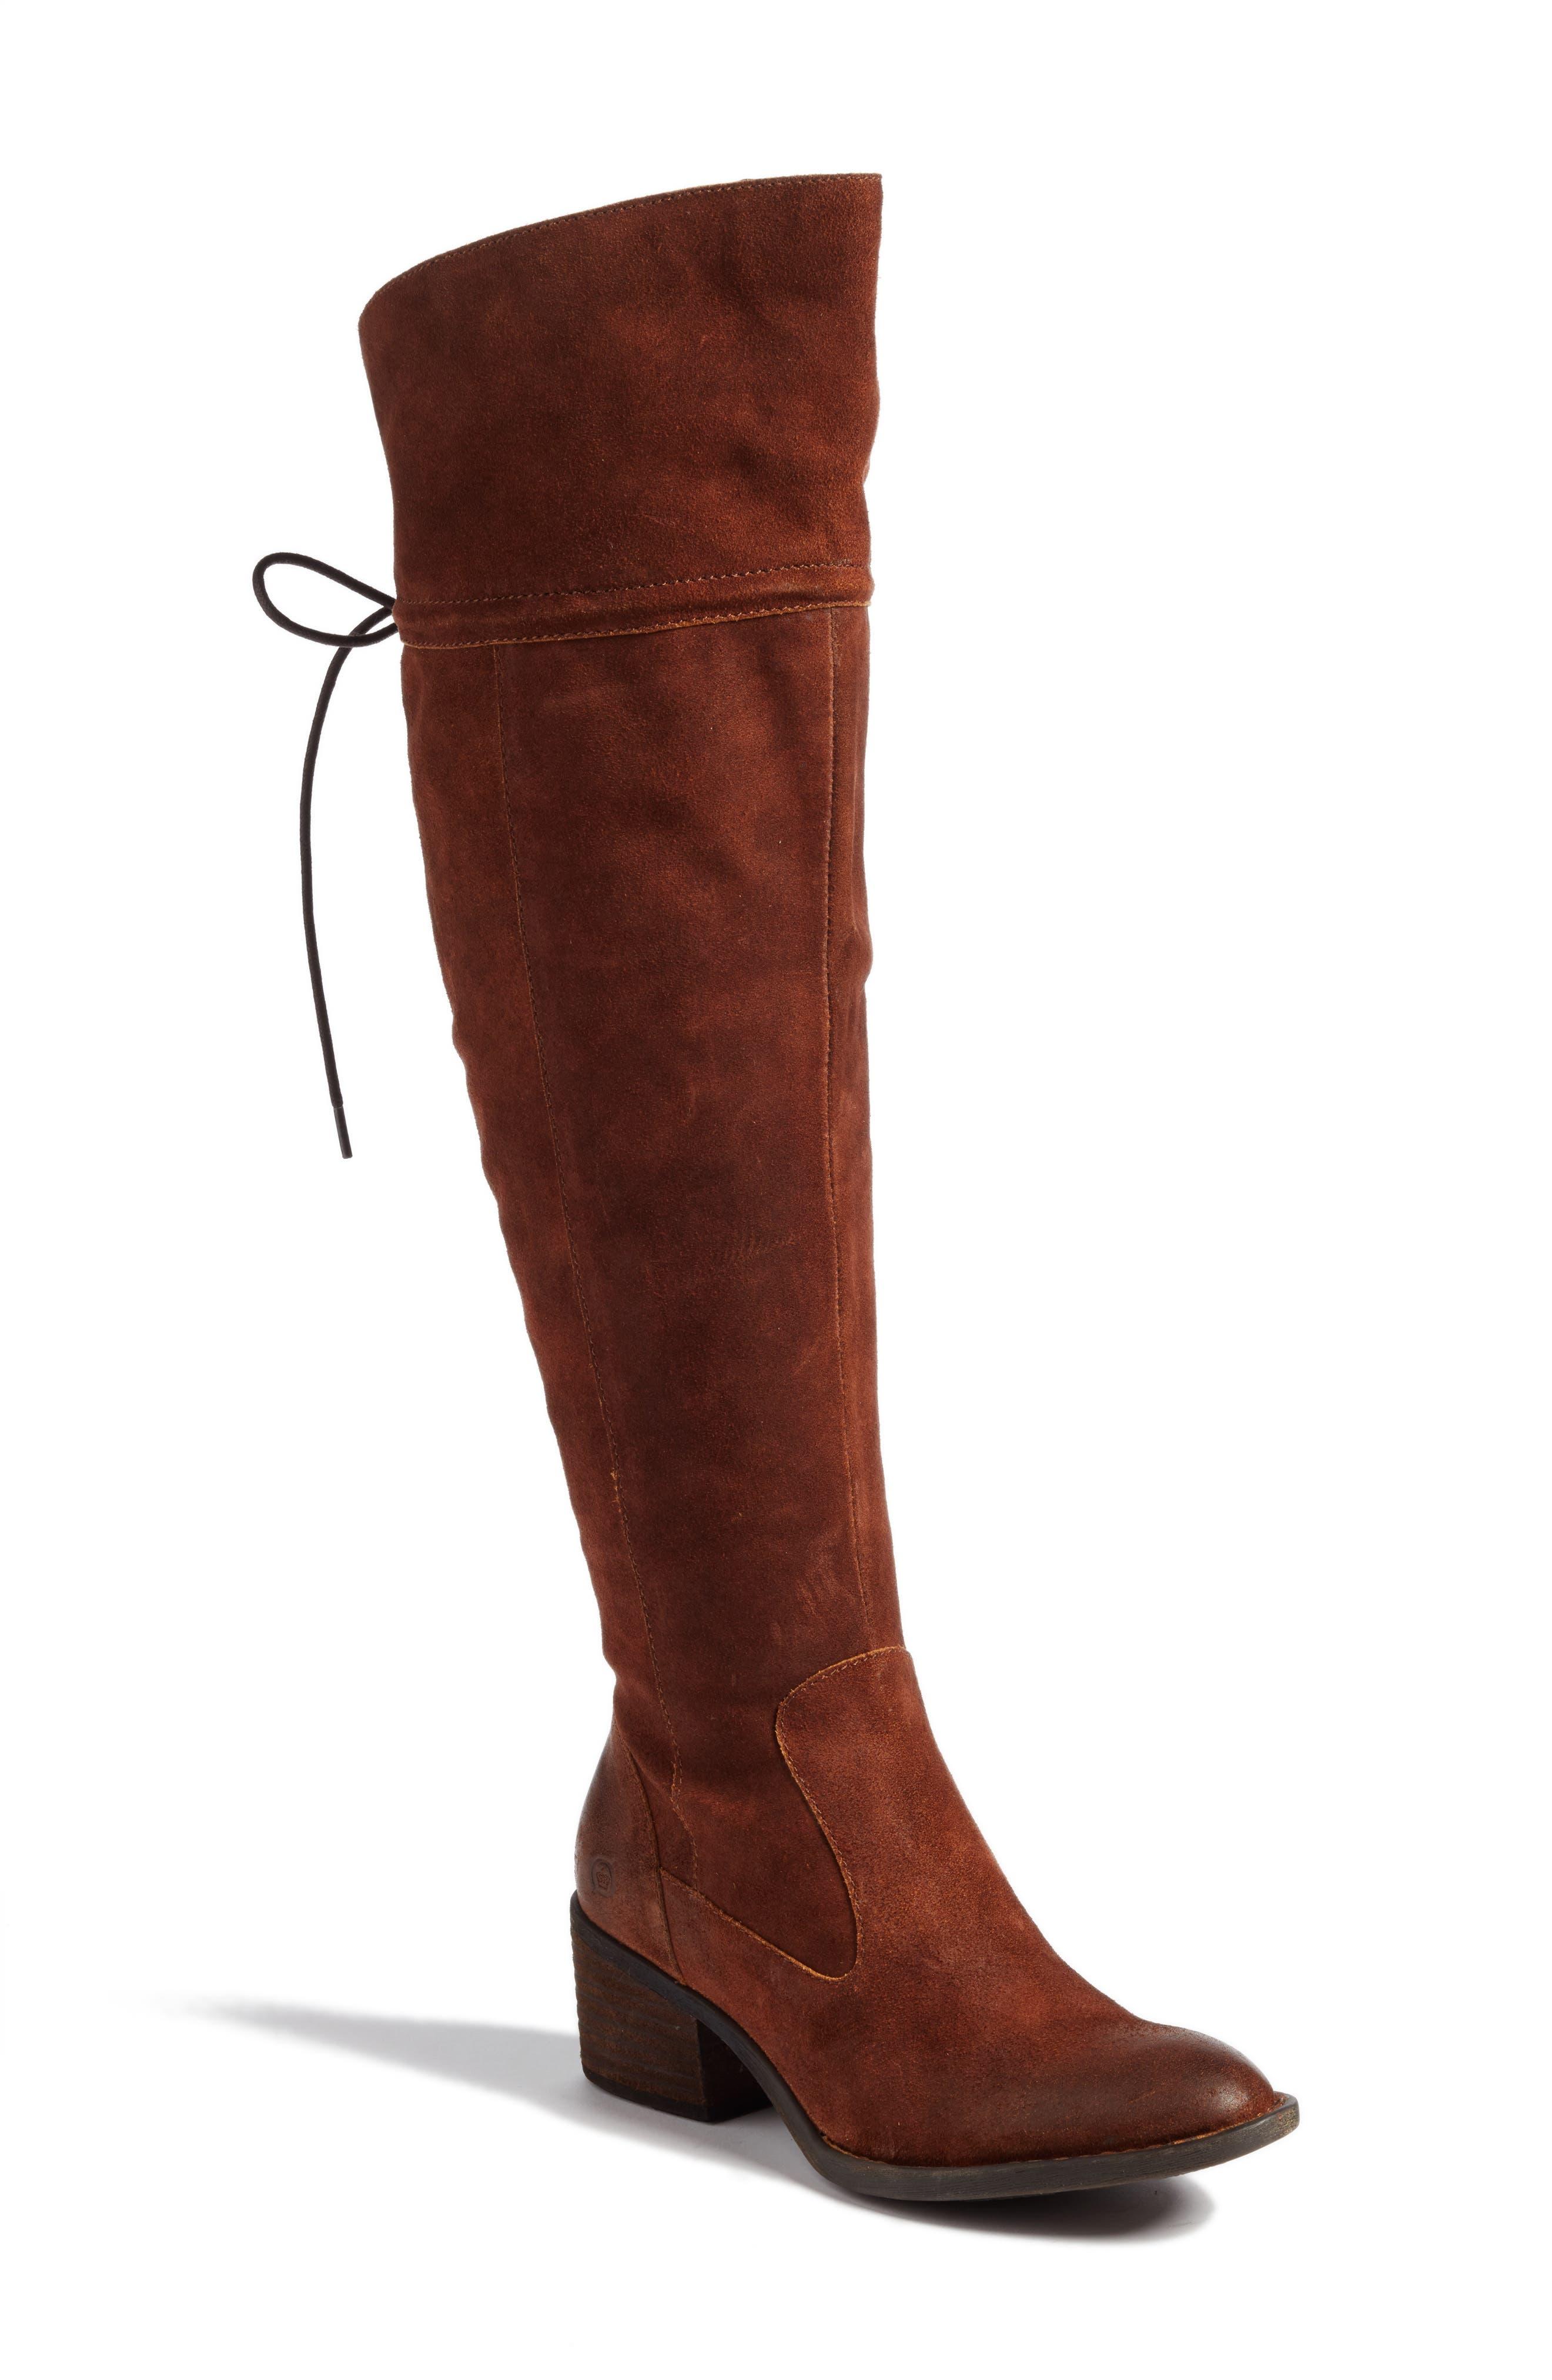 Alternate Image 1 Selected - Børn 'Gallinara' Over the Knee Boot (Women)